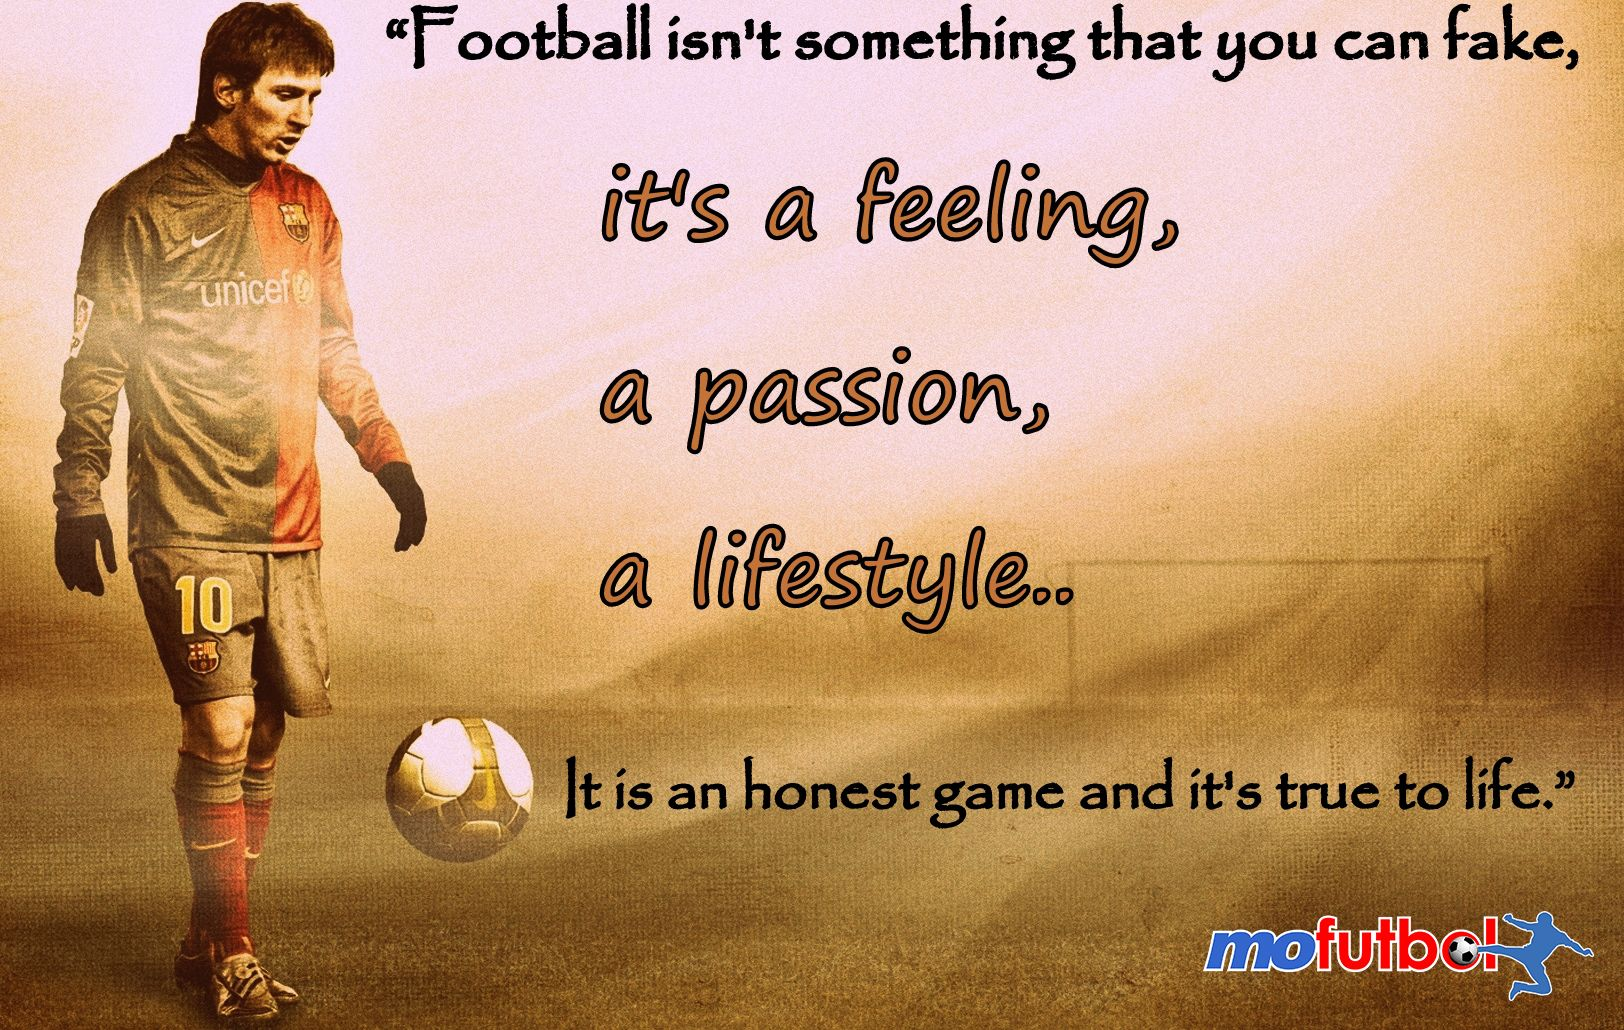 Pin By Mofutbol On Football Quotes Pinterest Football Football